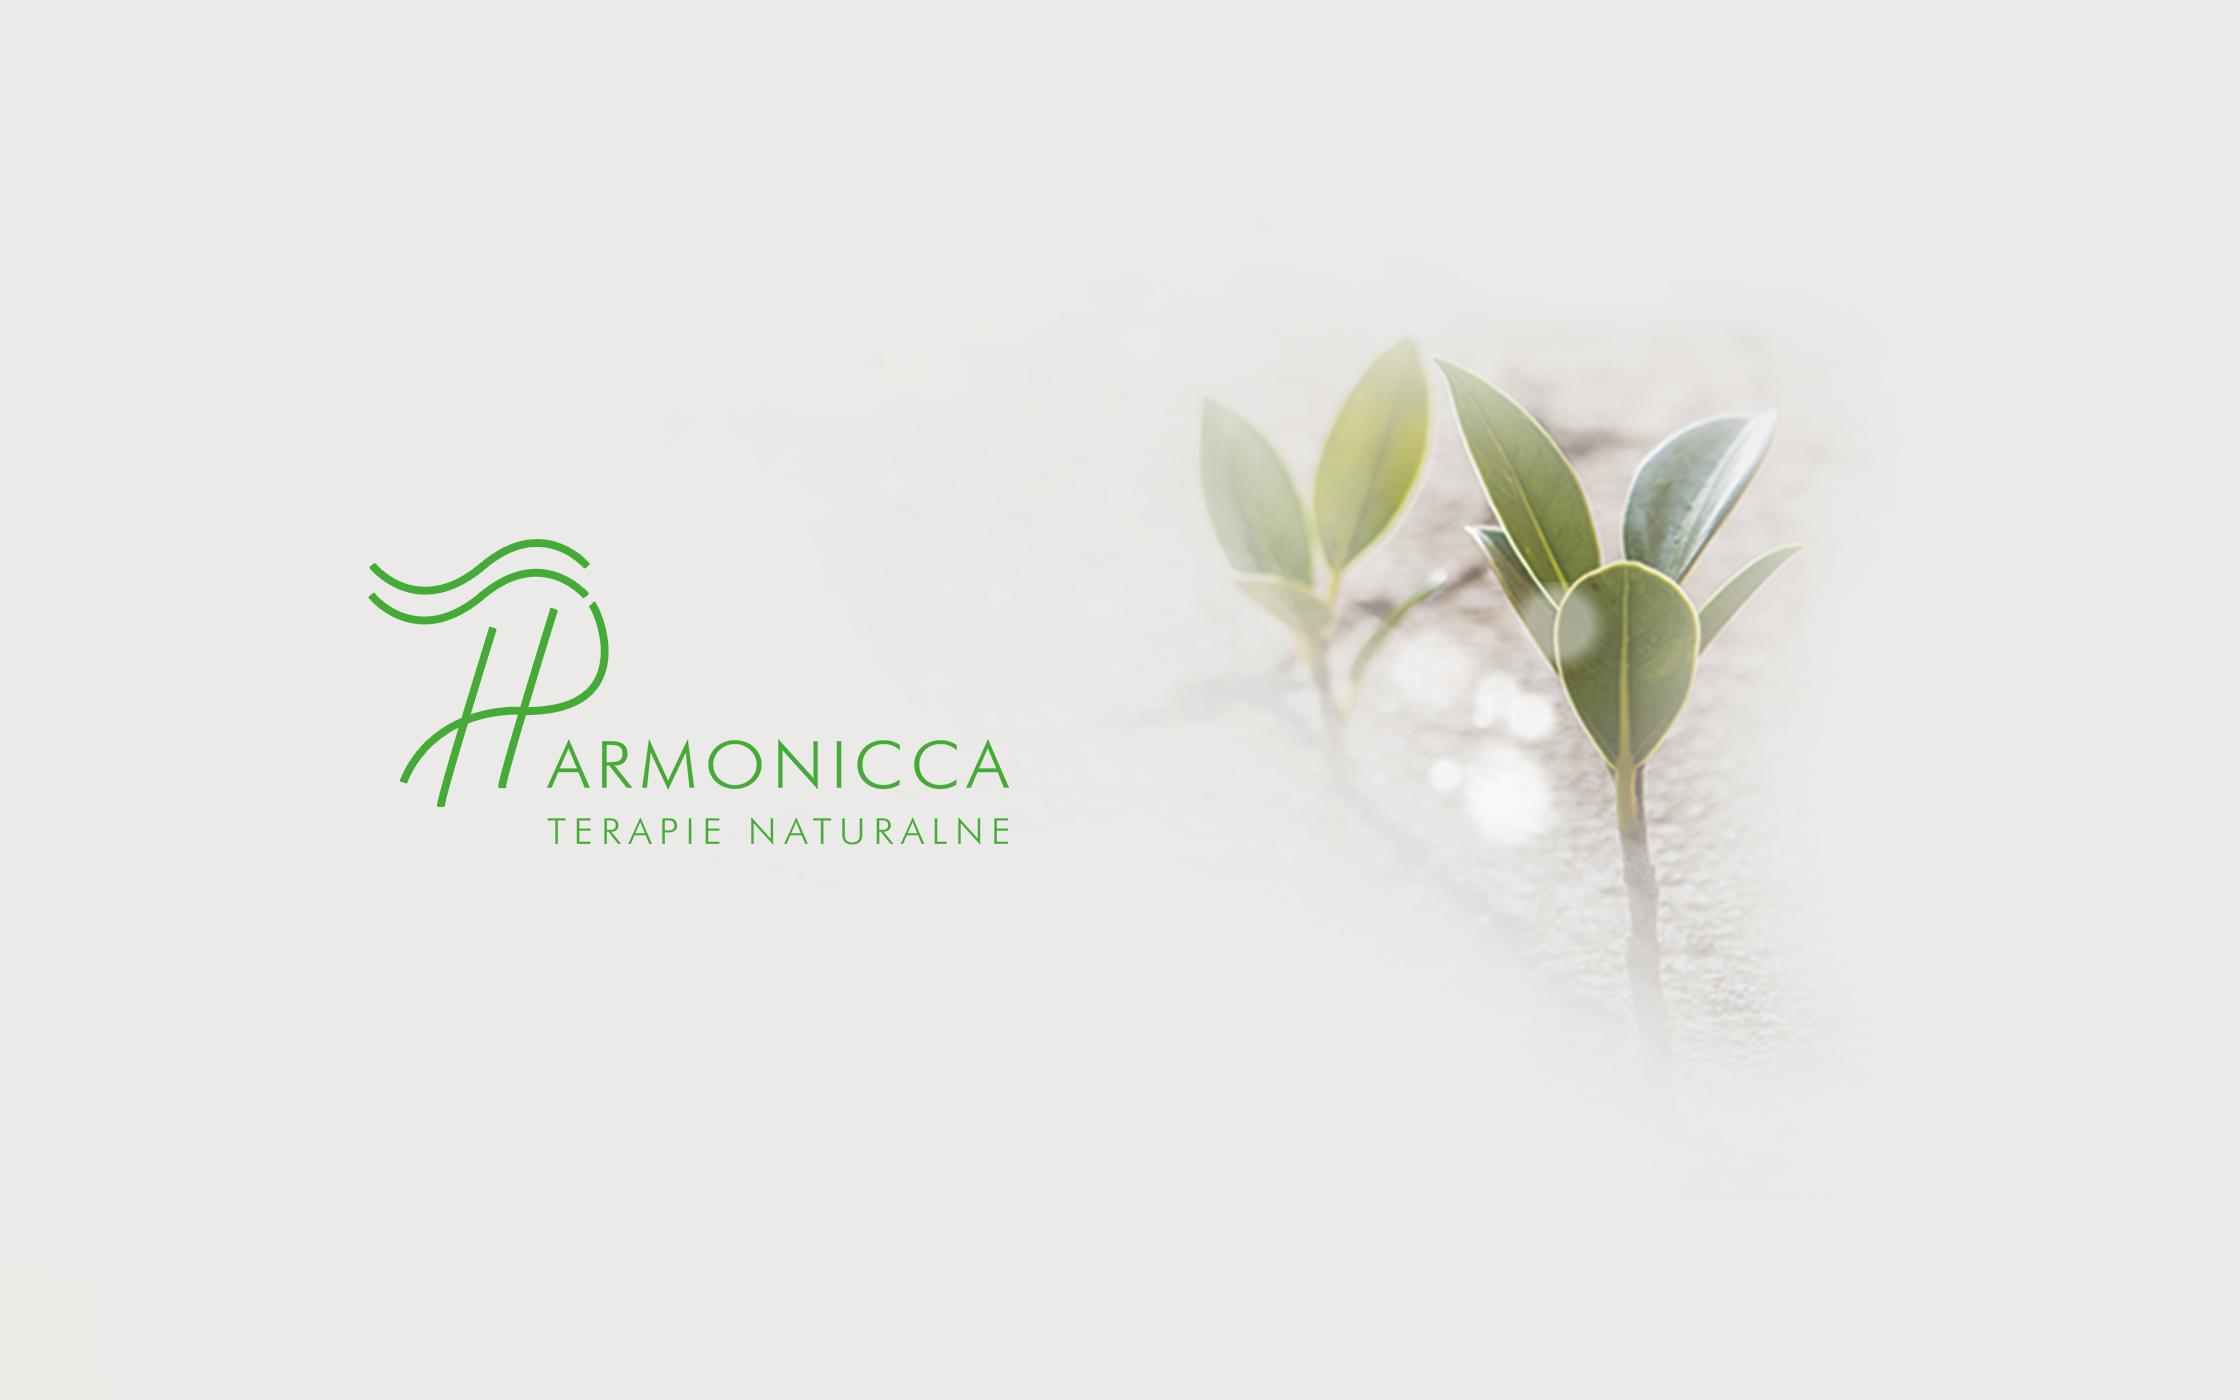 logo_harmonicca